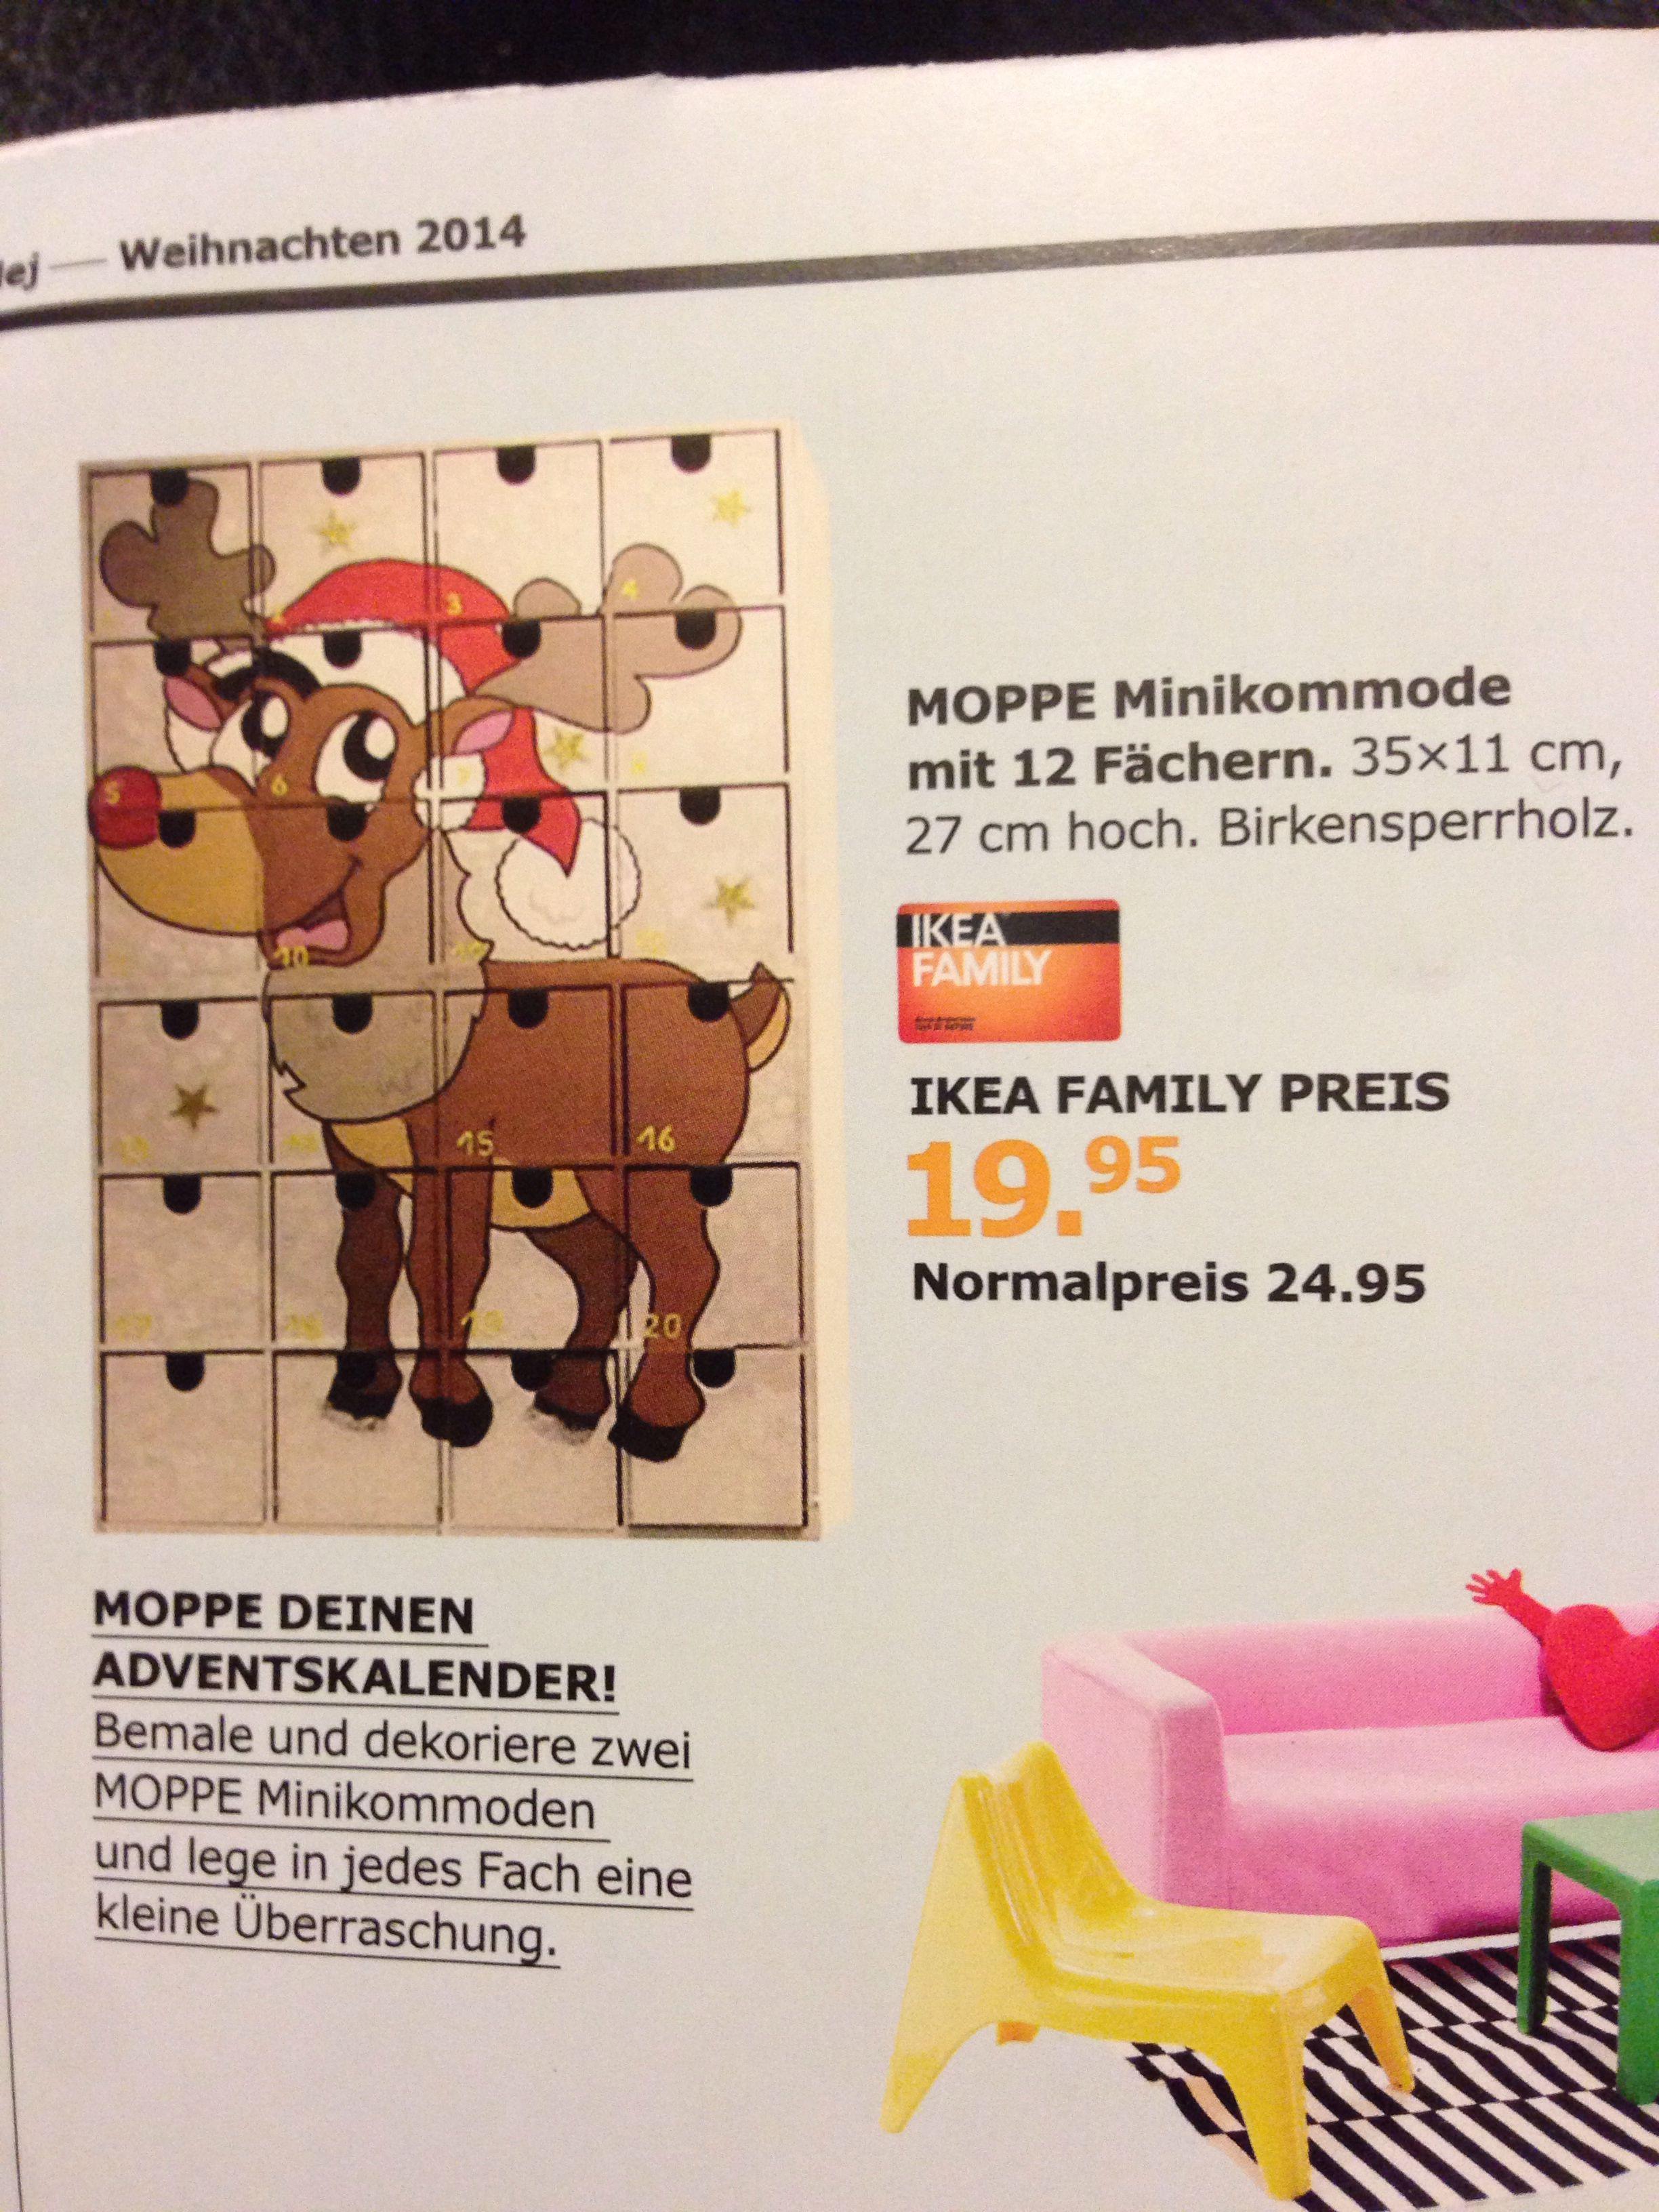 Weihnachtskalender Violetta.Moppe Adventskalender Ikea Christmas Adventskalender